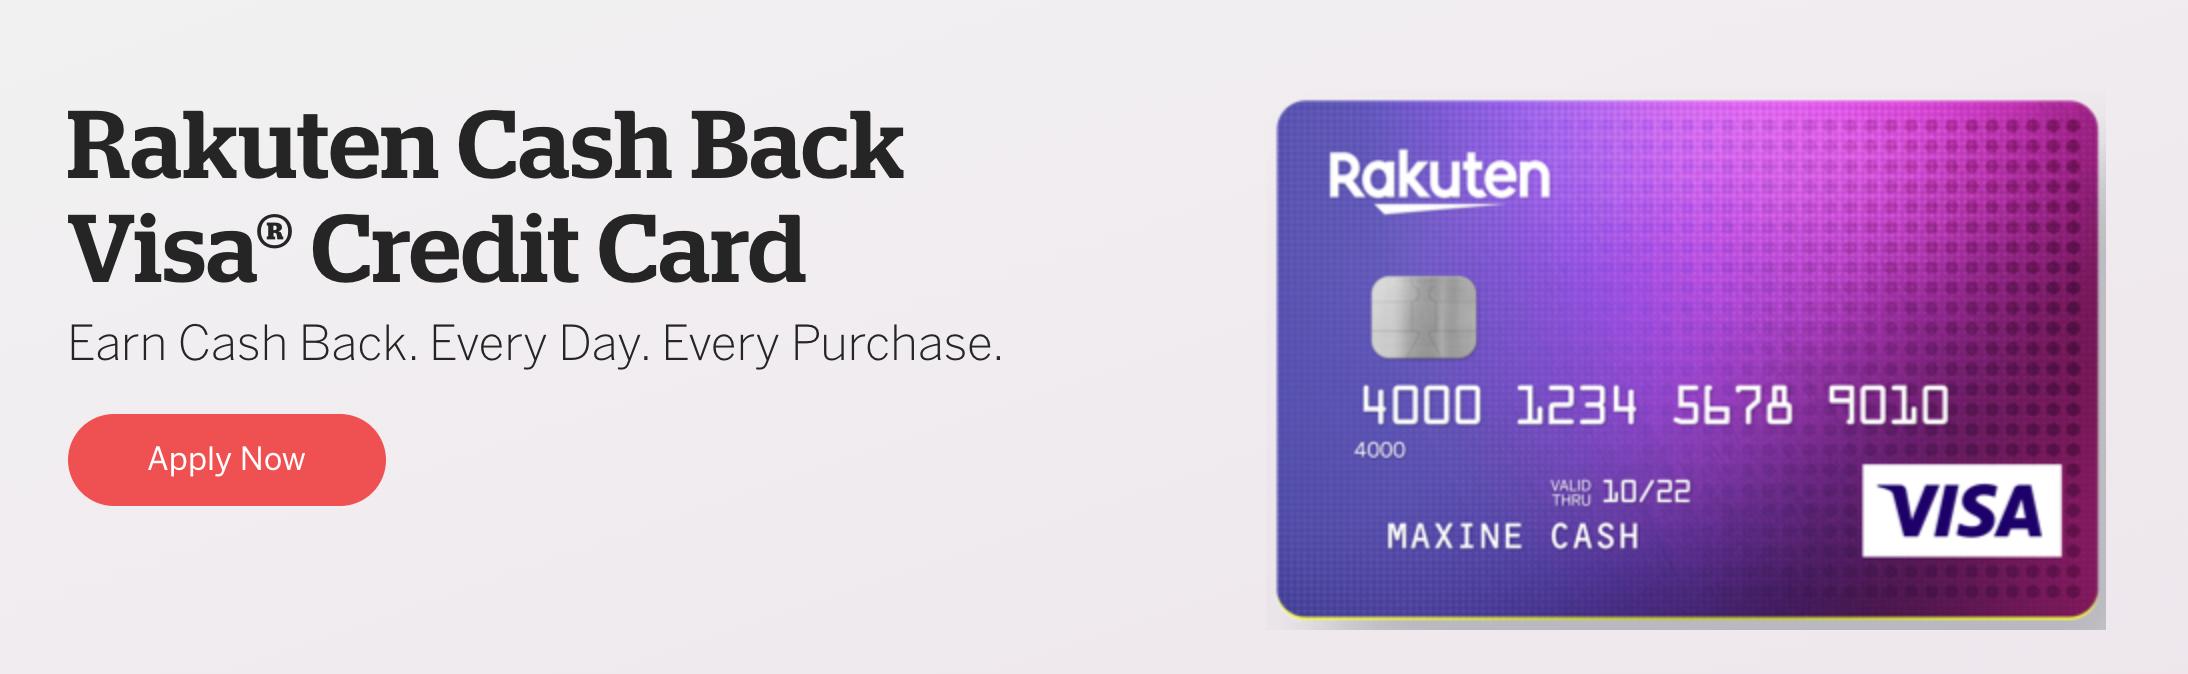 Rakuten Review Shop & Earn Cash Back or Amex Points [12]